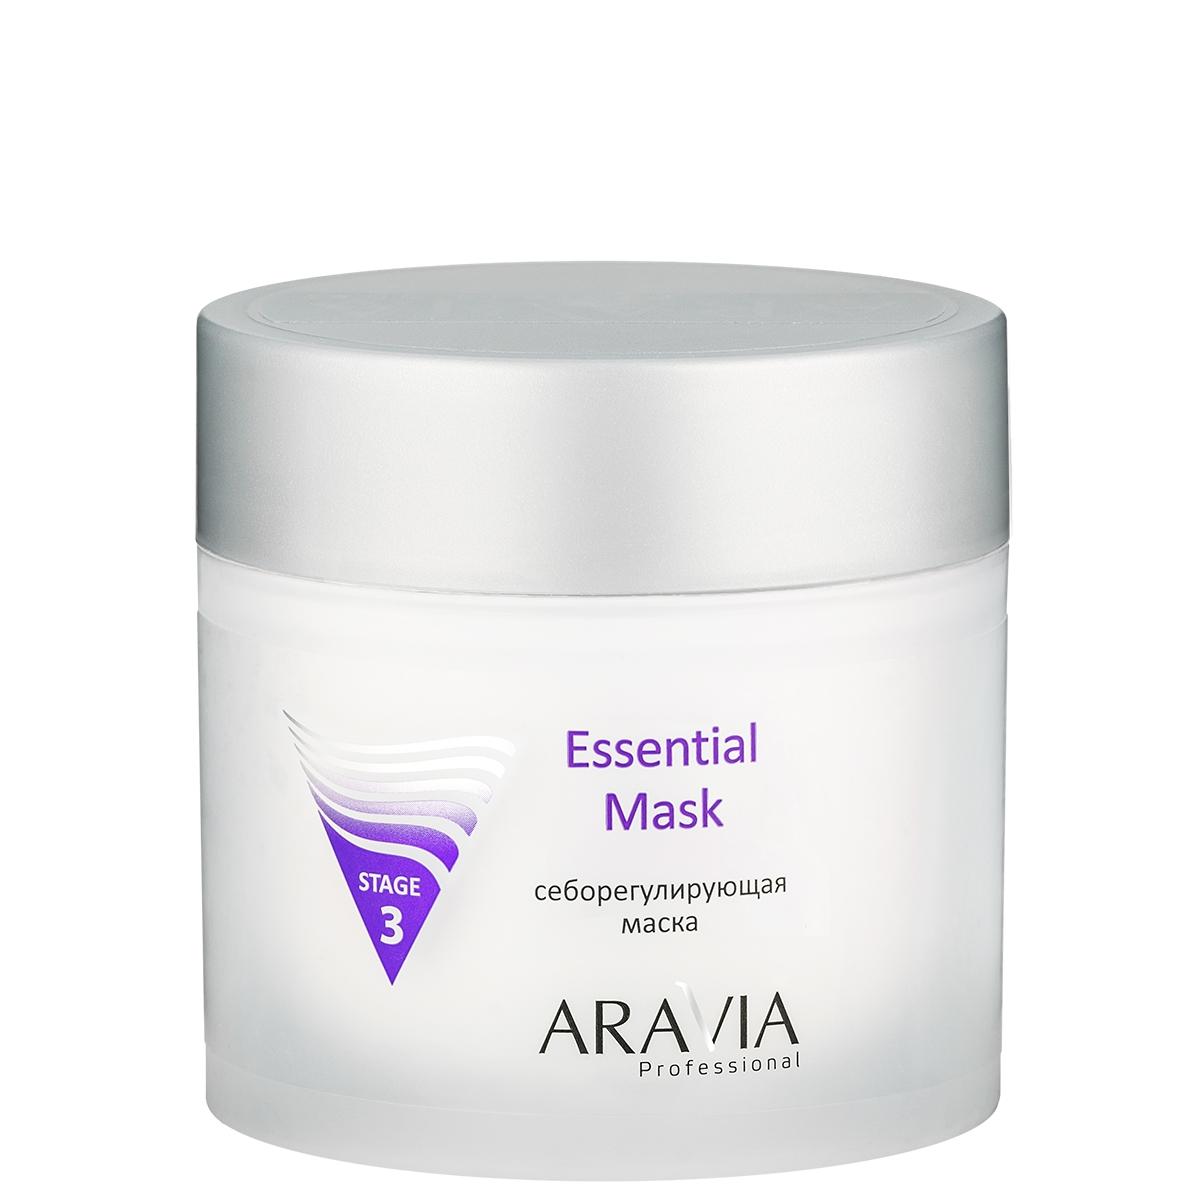 ARAVIA Маска Essential MaskСеборегулирующая, 300 мл